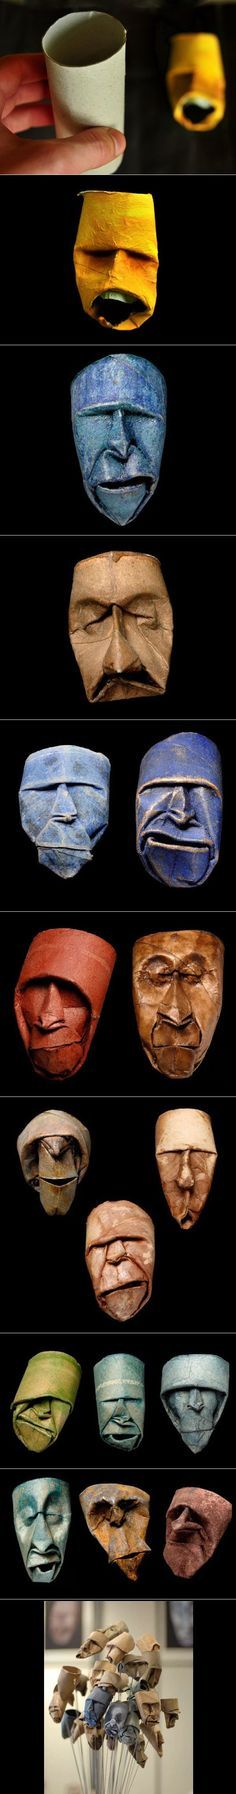 Geniale Masken aus Klopapierrollen - Win Bild   Webfail - Fail Bilder und Fail Videos